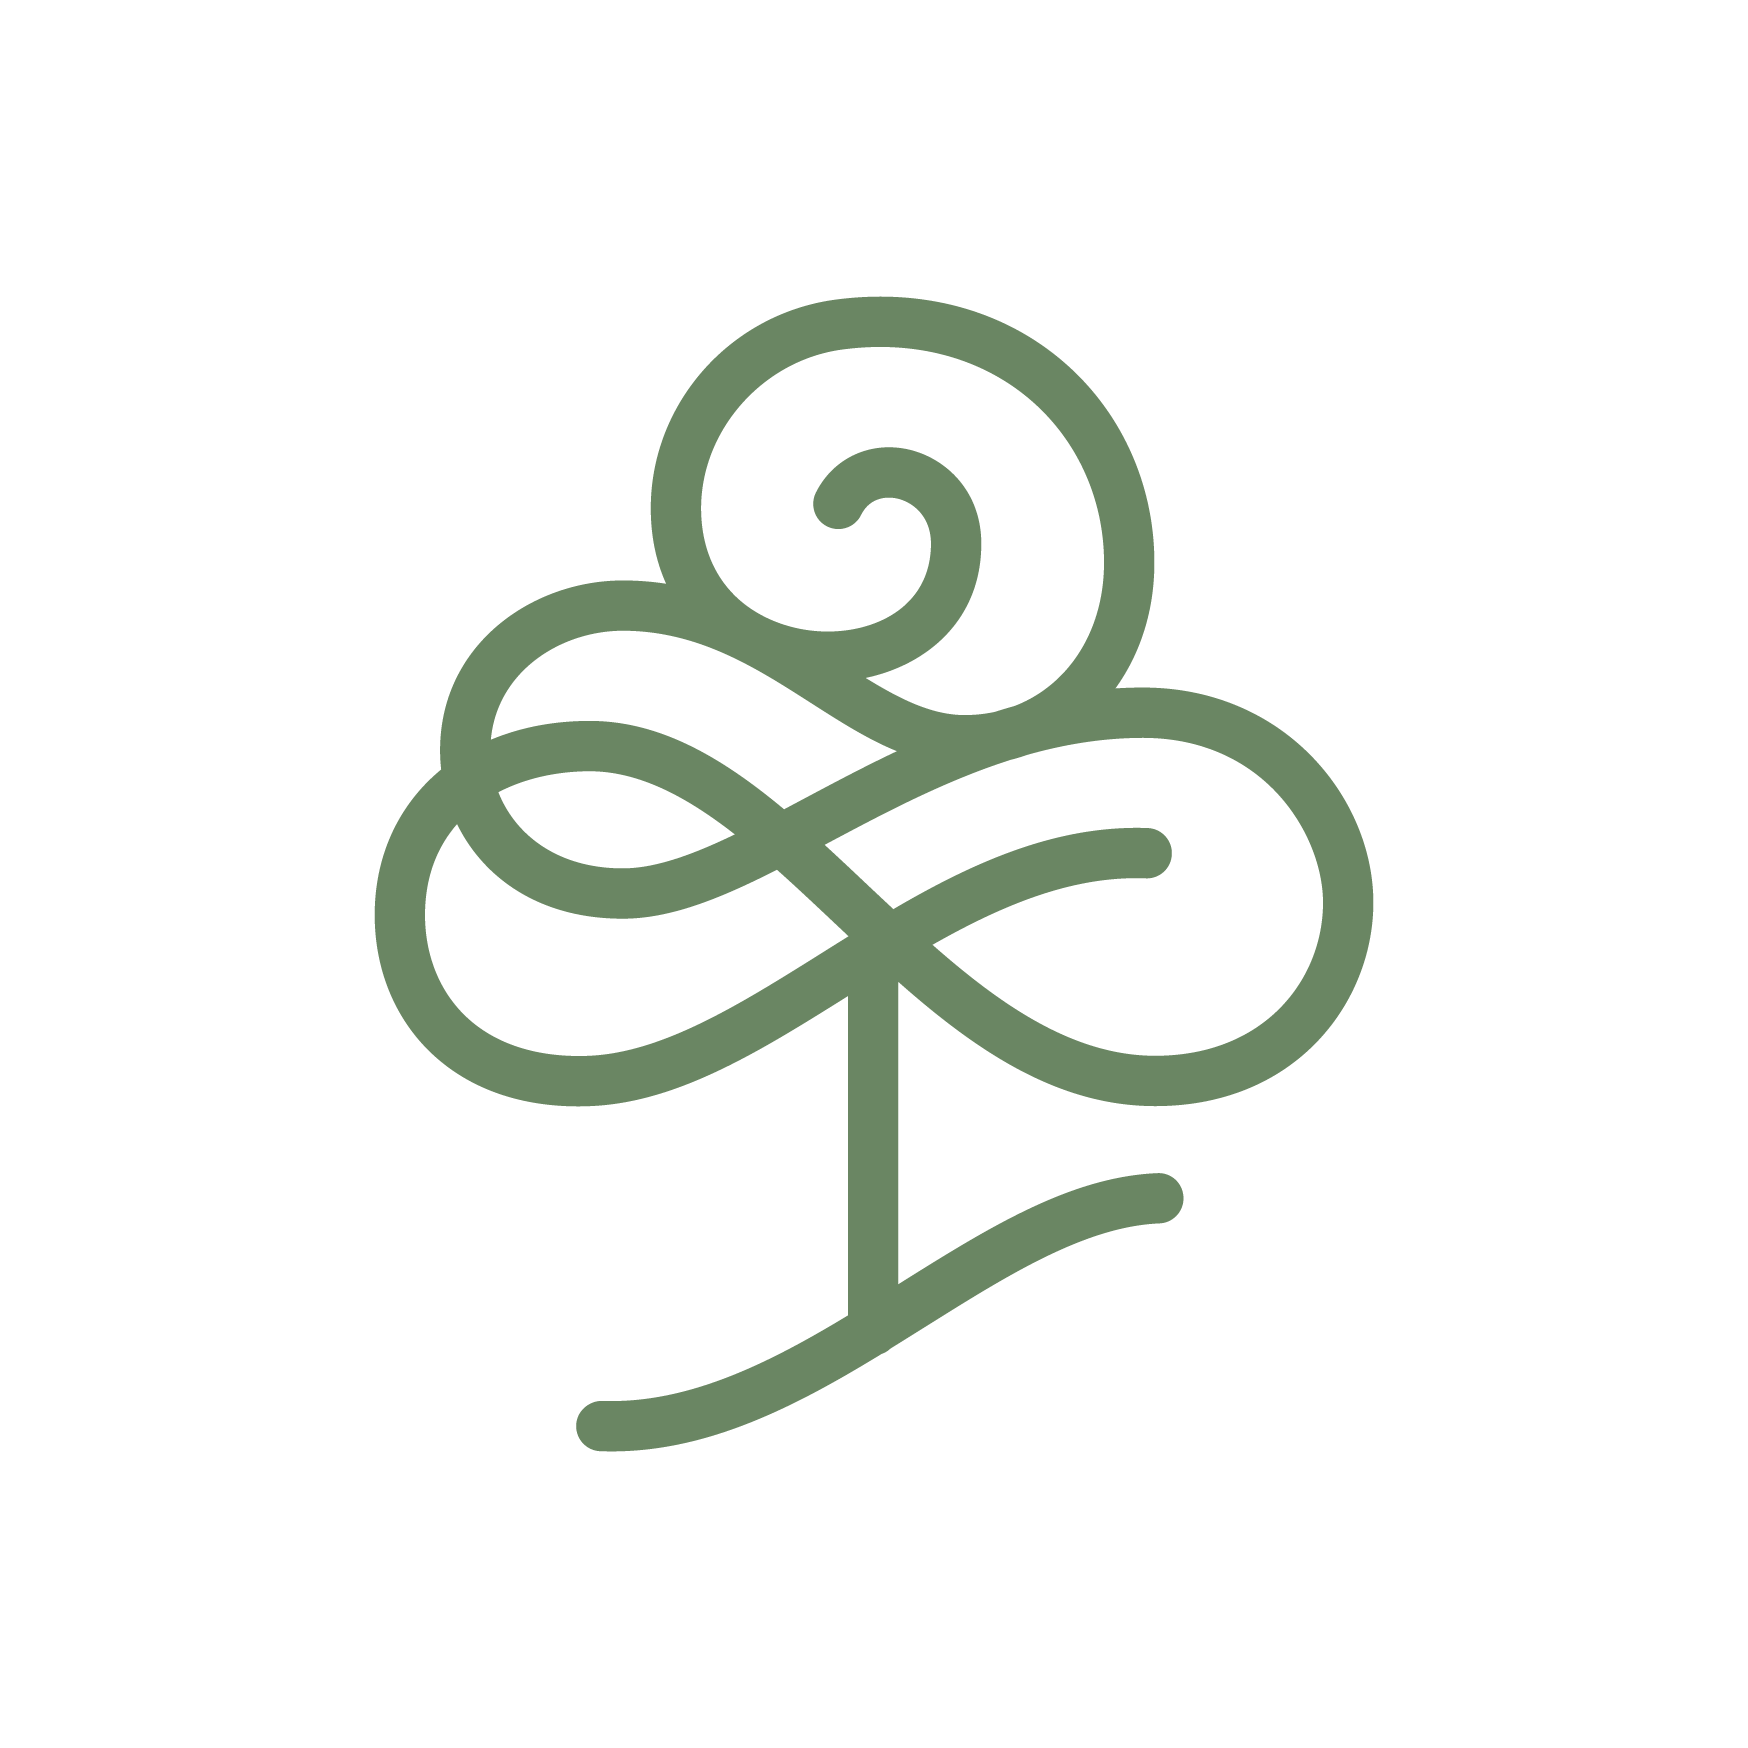 mockup_logo02